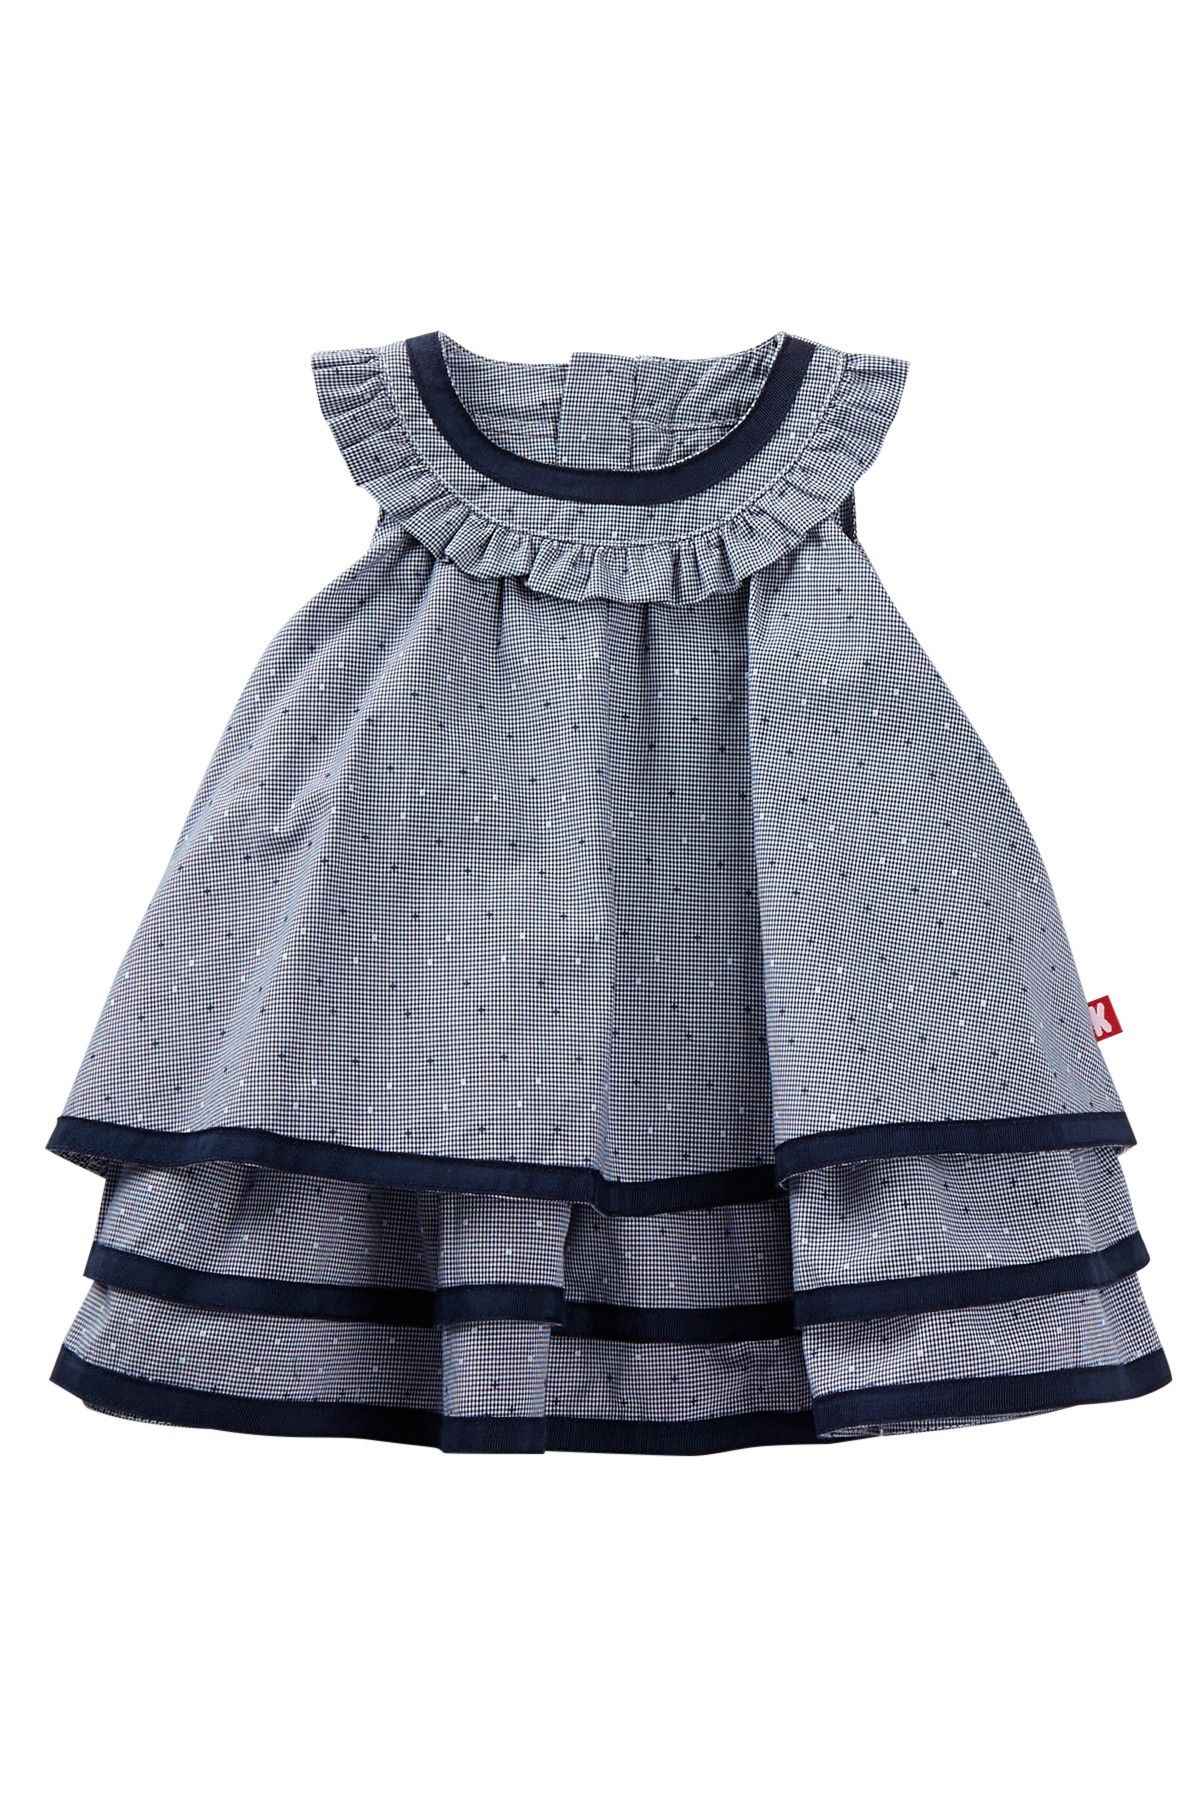 moda infantil kanz